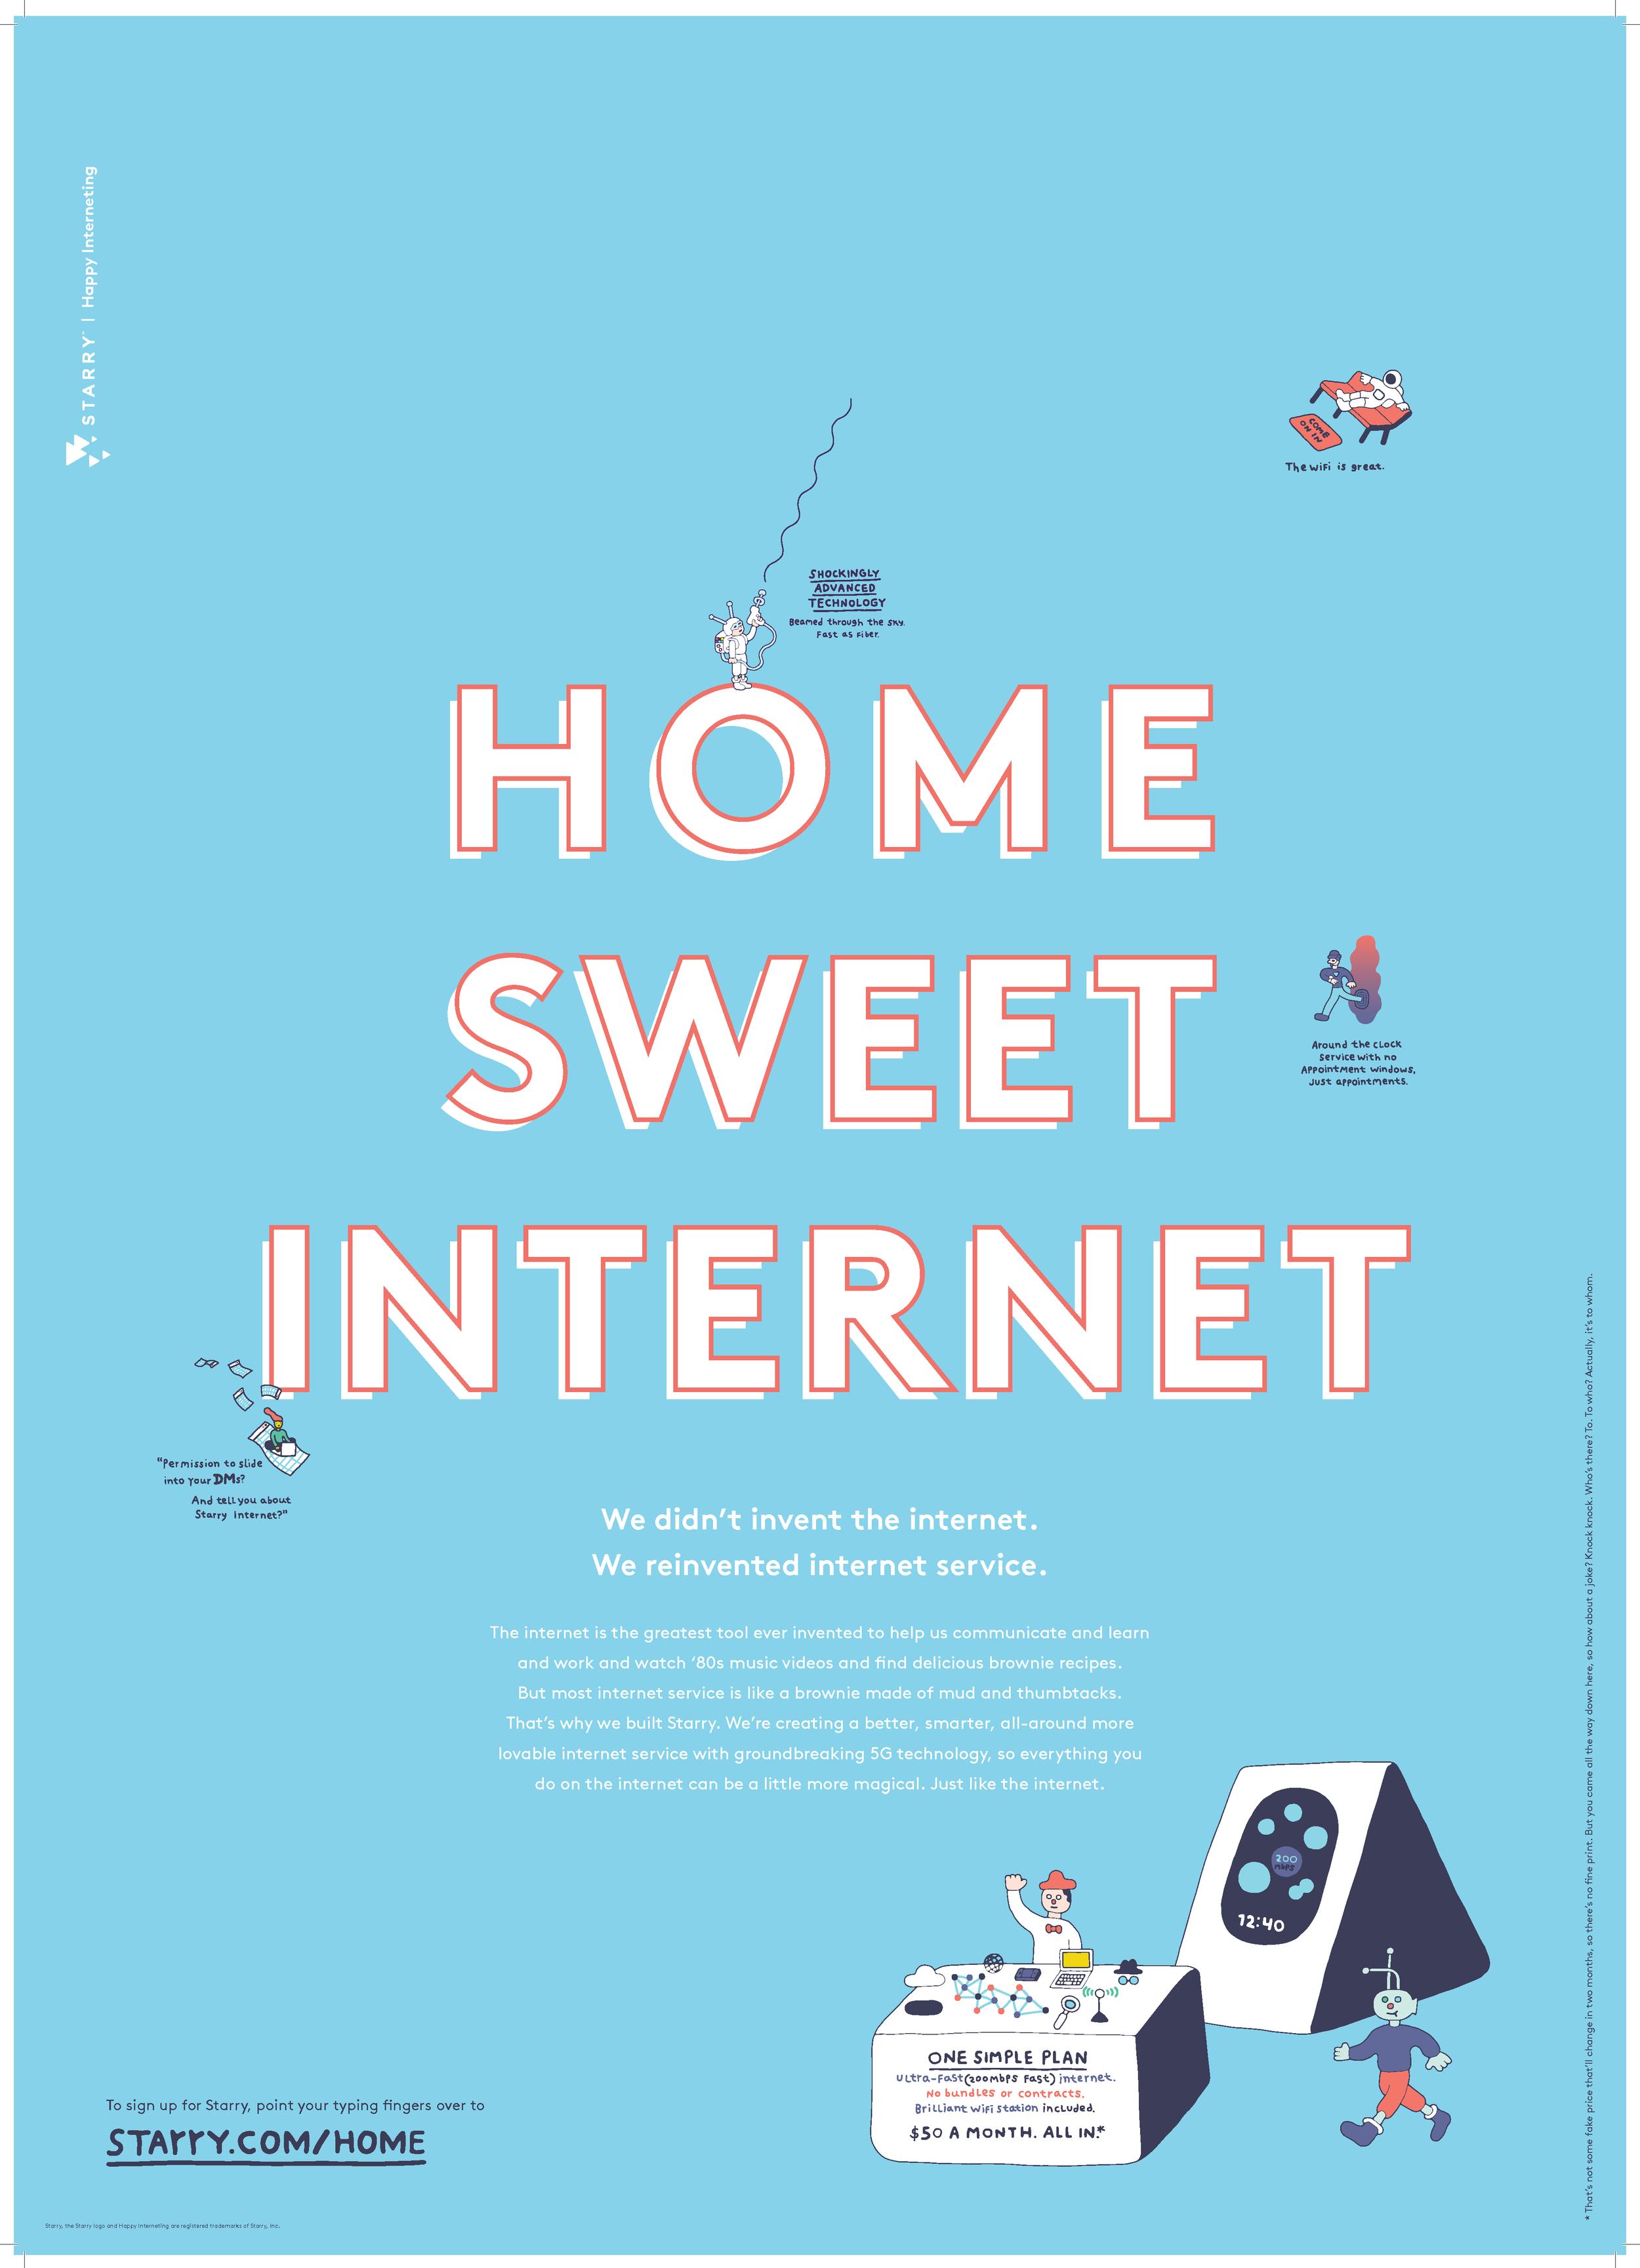 Home Sweet Internet — Back